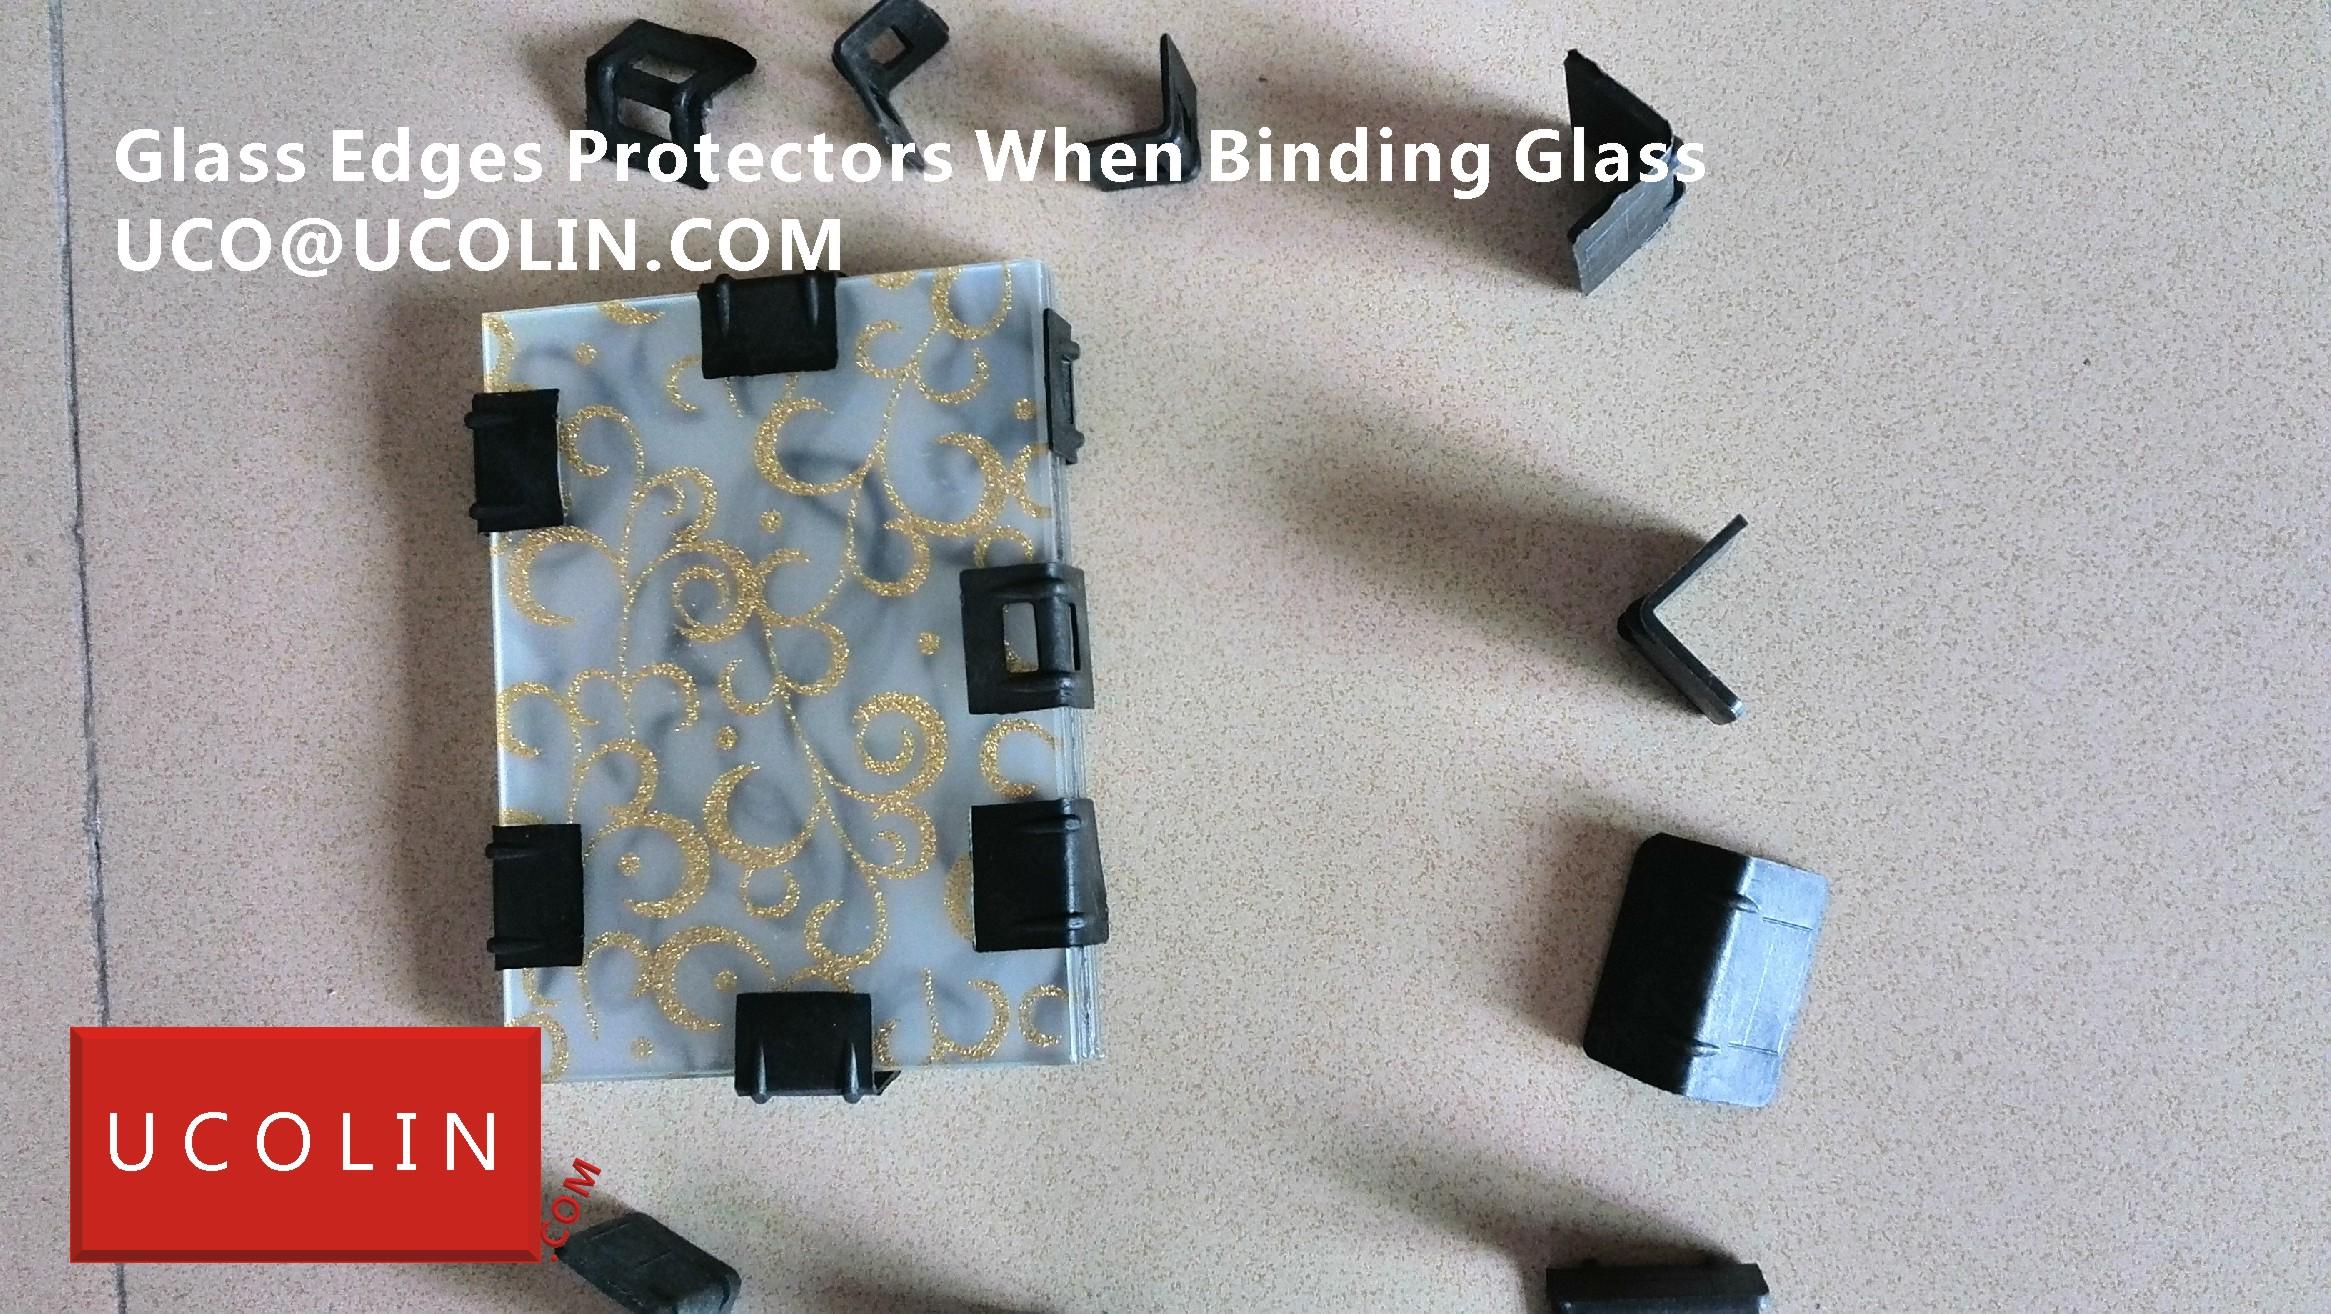 02 GLASS ANGLES PROTECTORS GLASS EDGES PROTECTORS